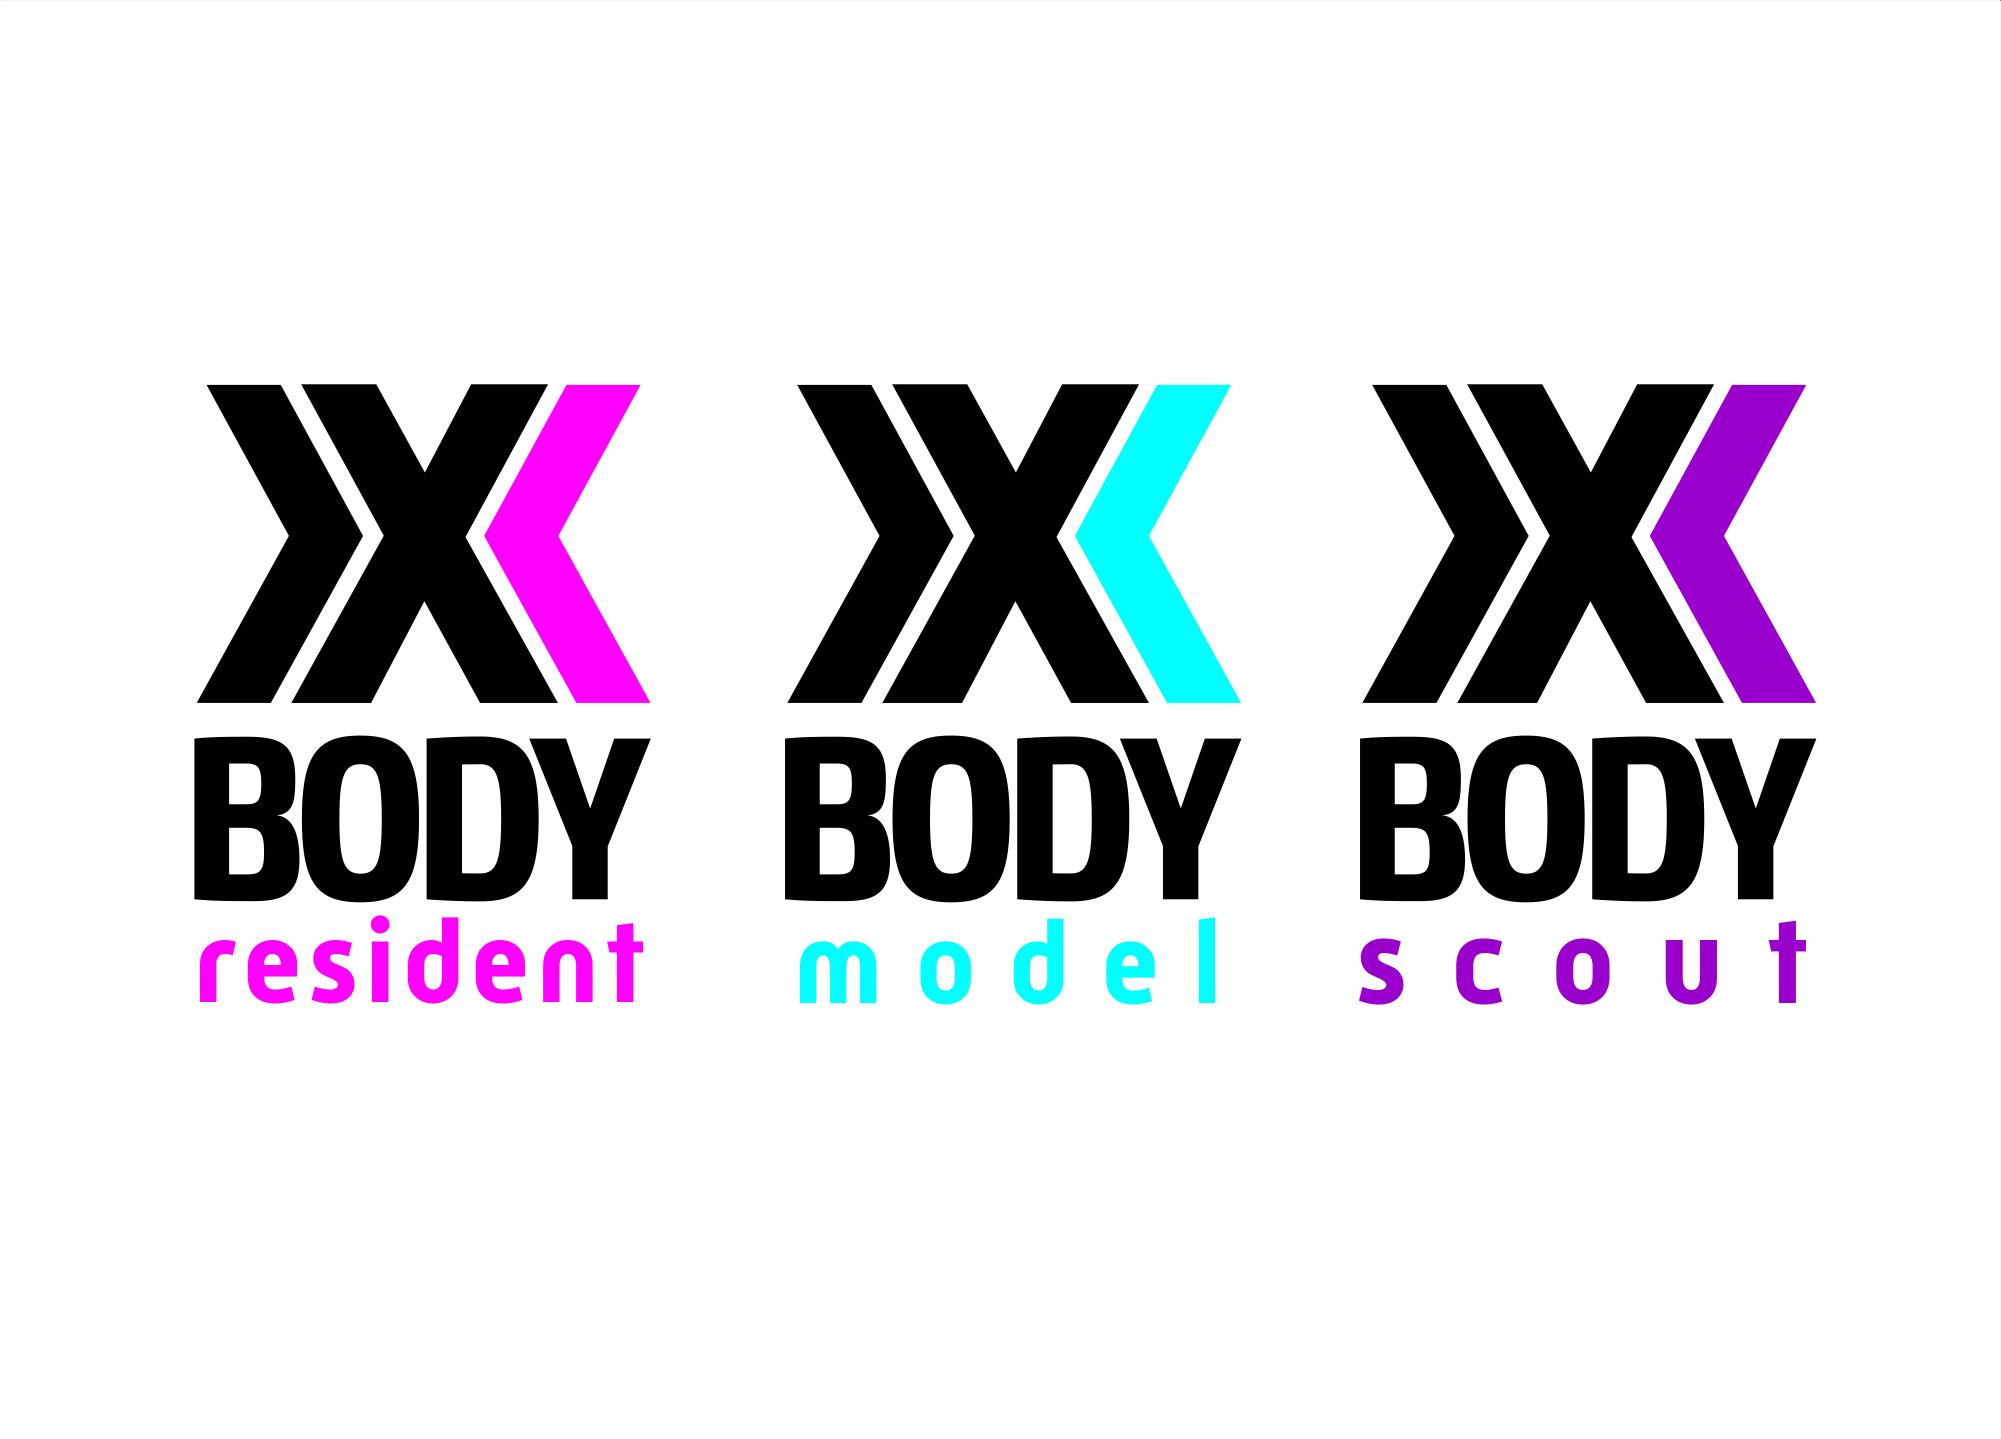 Разработка логотипа (видеоблог для моделей) фото f_0045b28151c5c3ac.png